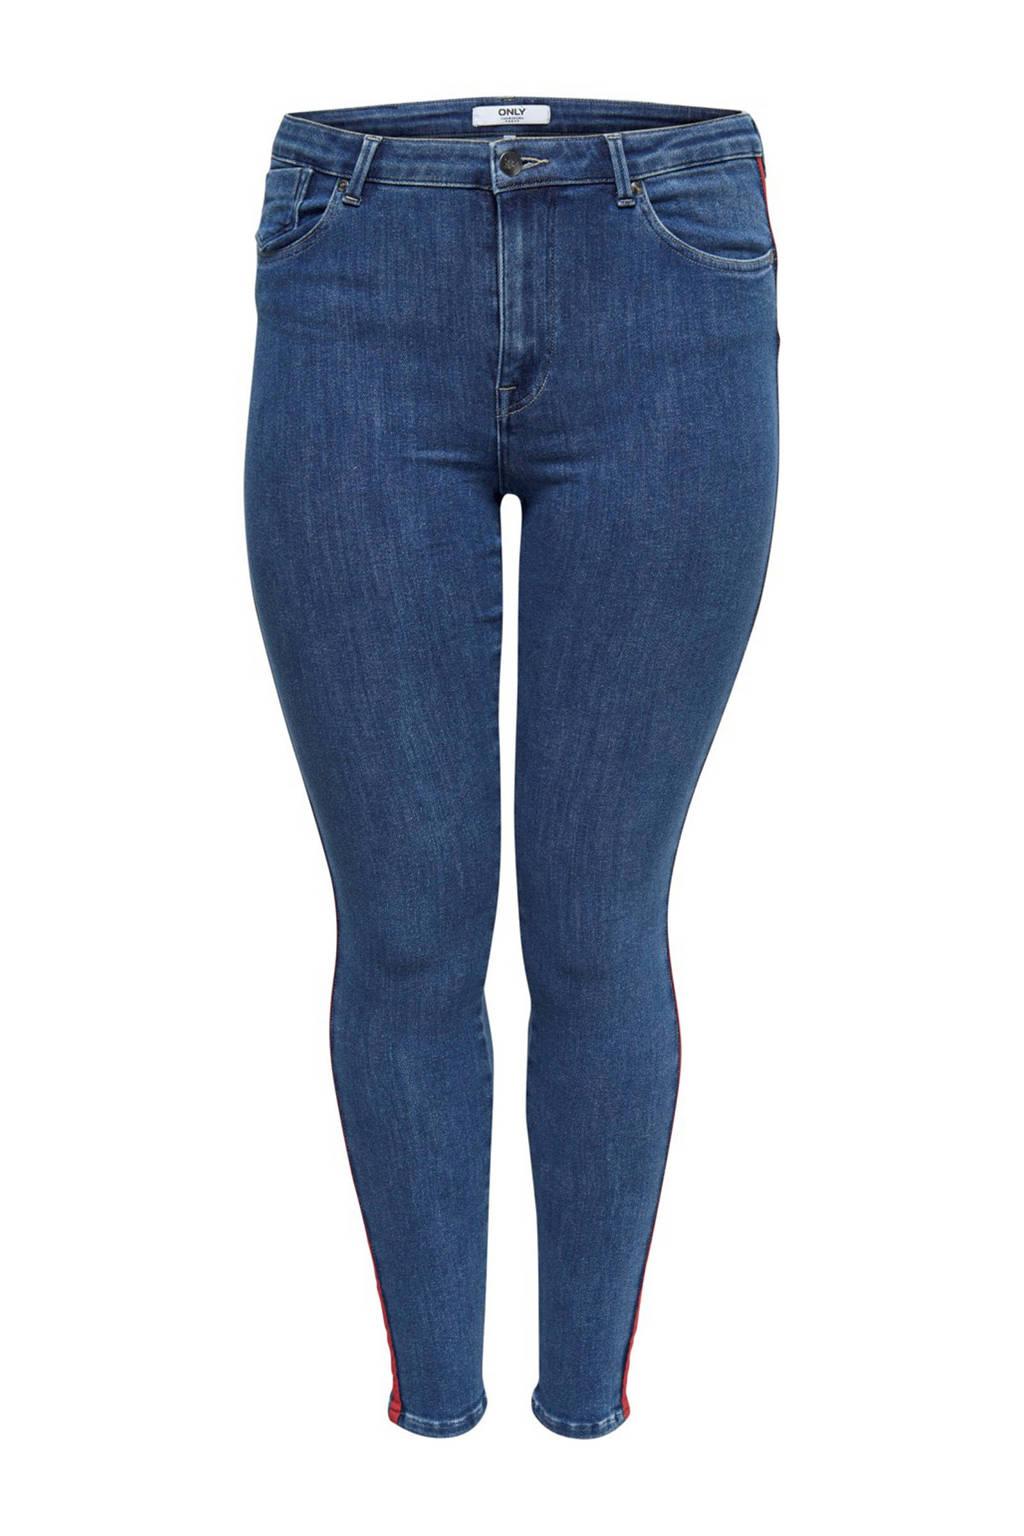 ONLY carmakoma jeans met zijstreep, Blauw/rood